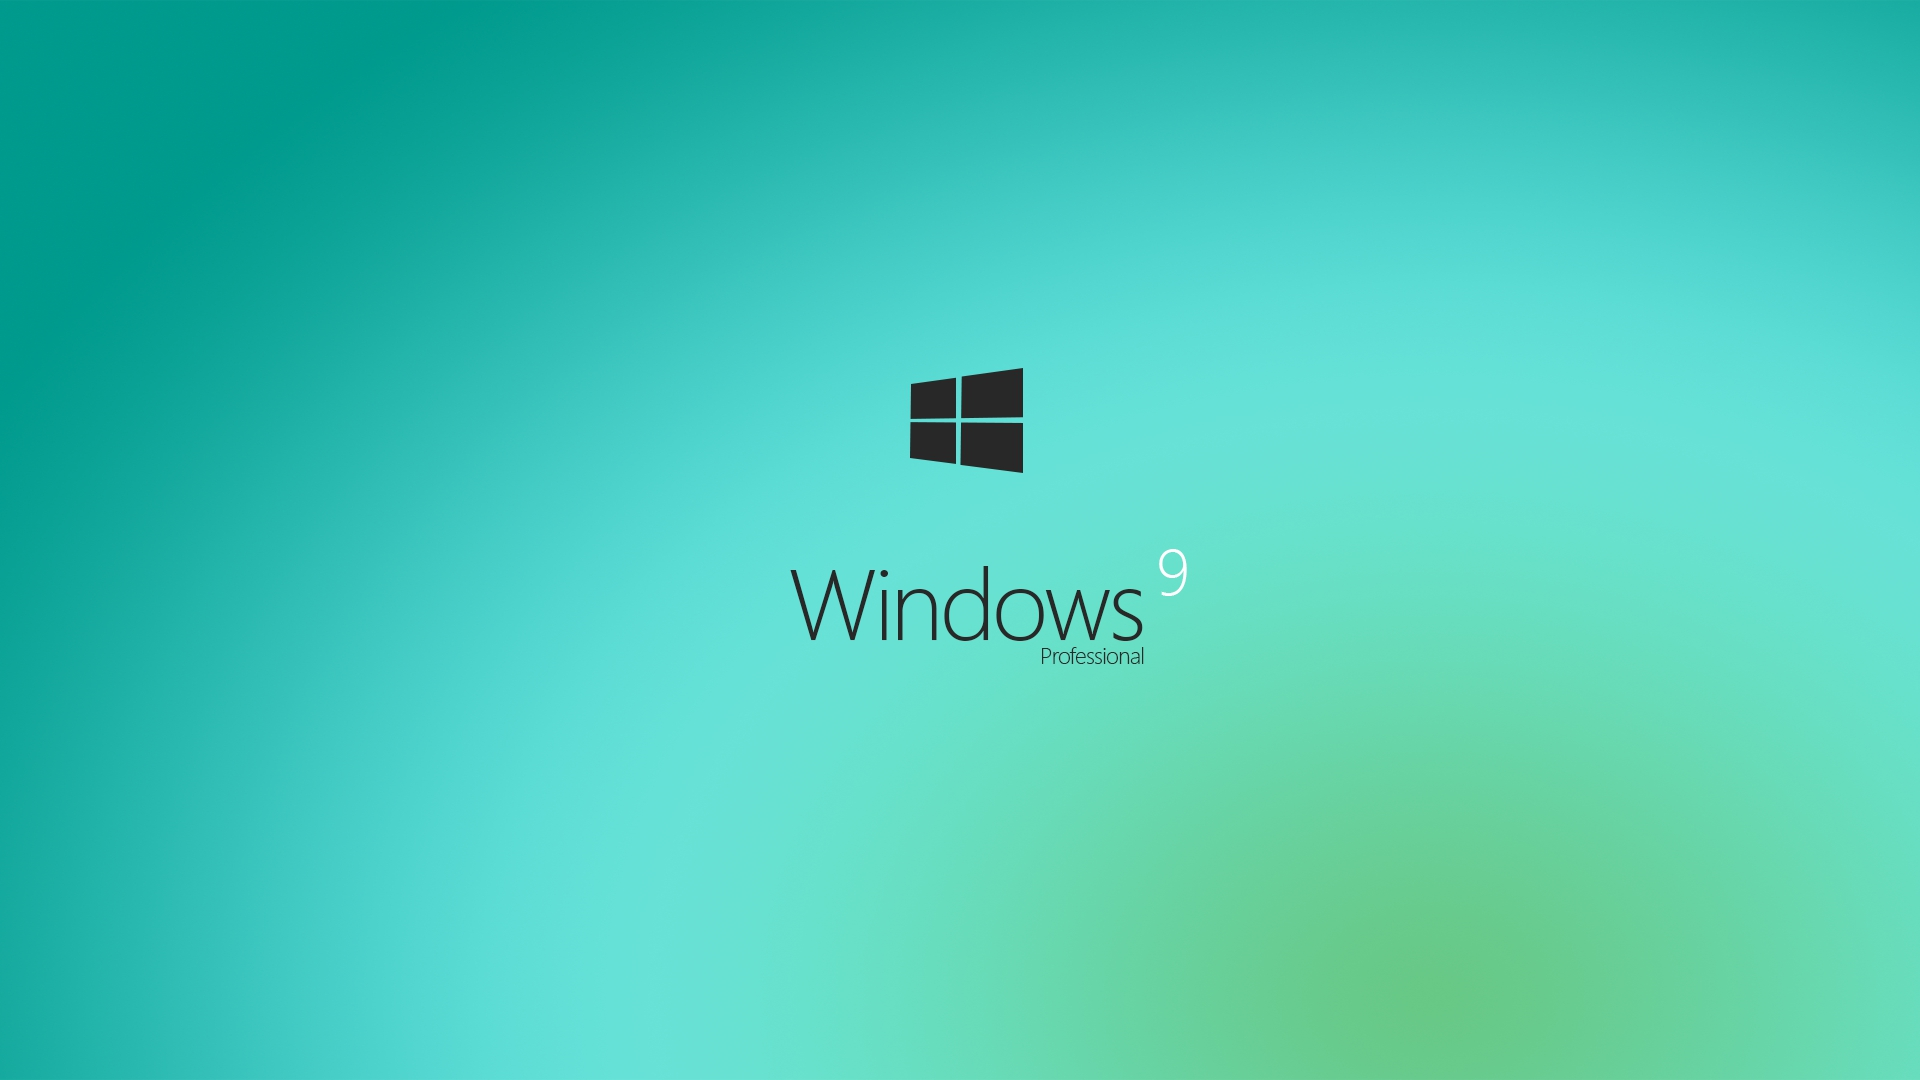 Windows 9 Professional - TecnOdia